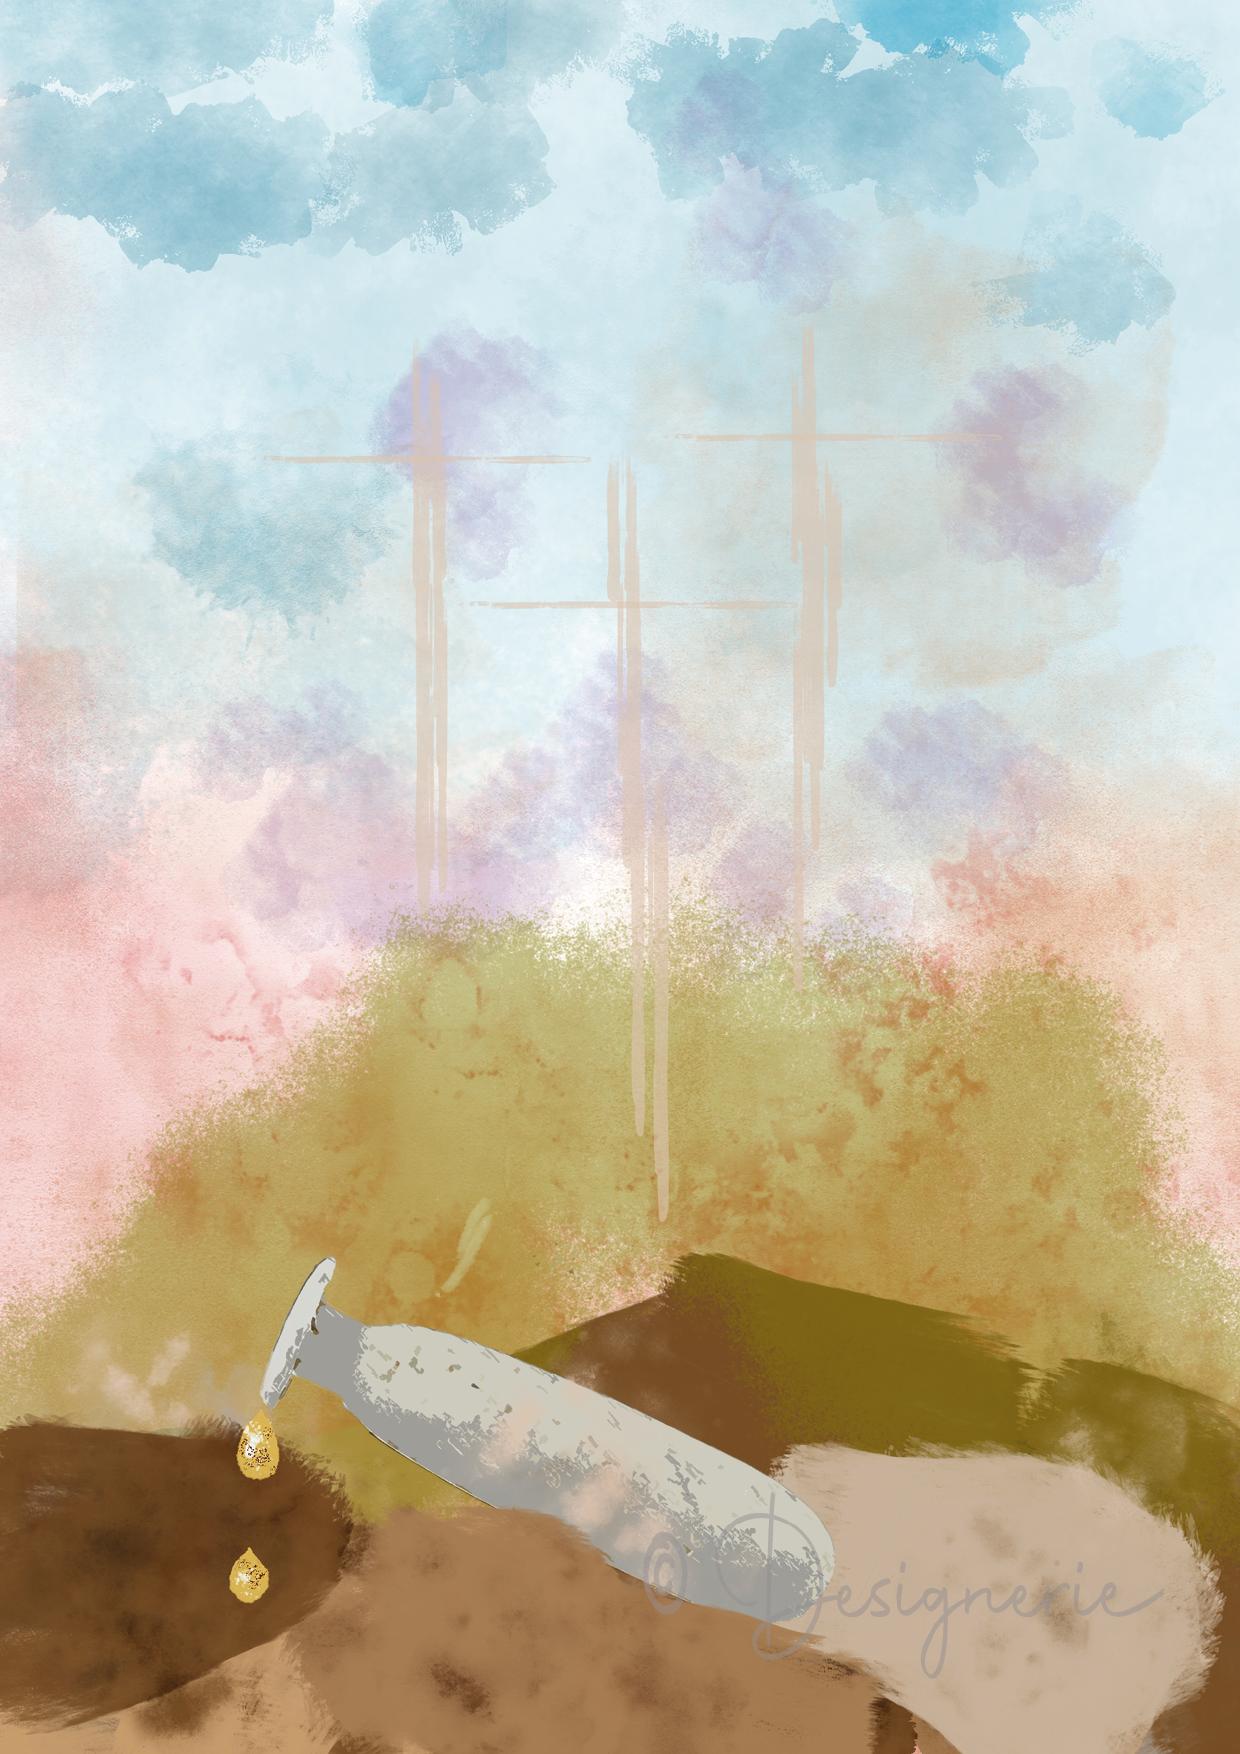 2e schilderij 40-dagentijd - Albasten kruikje